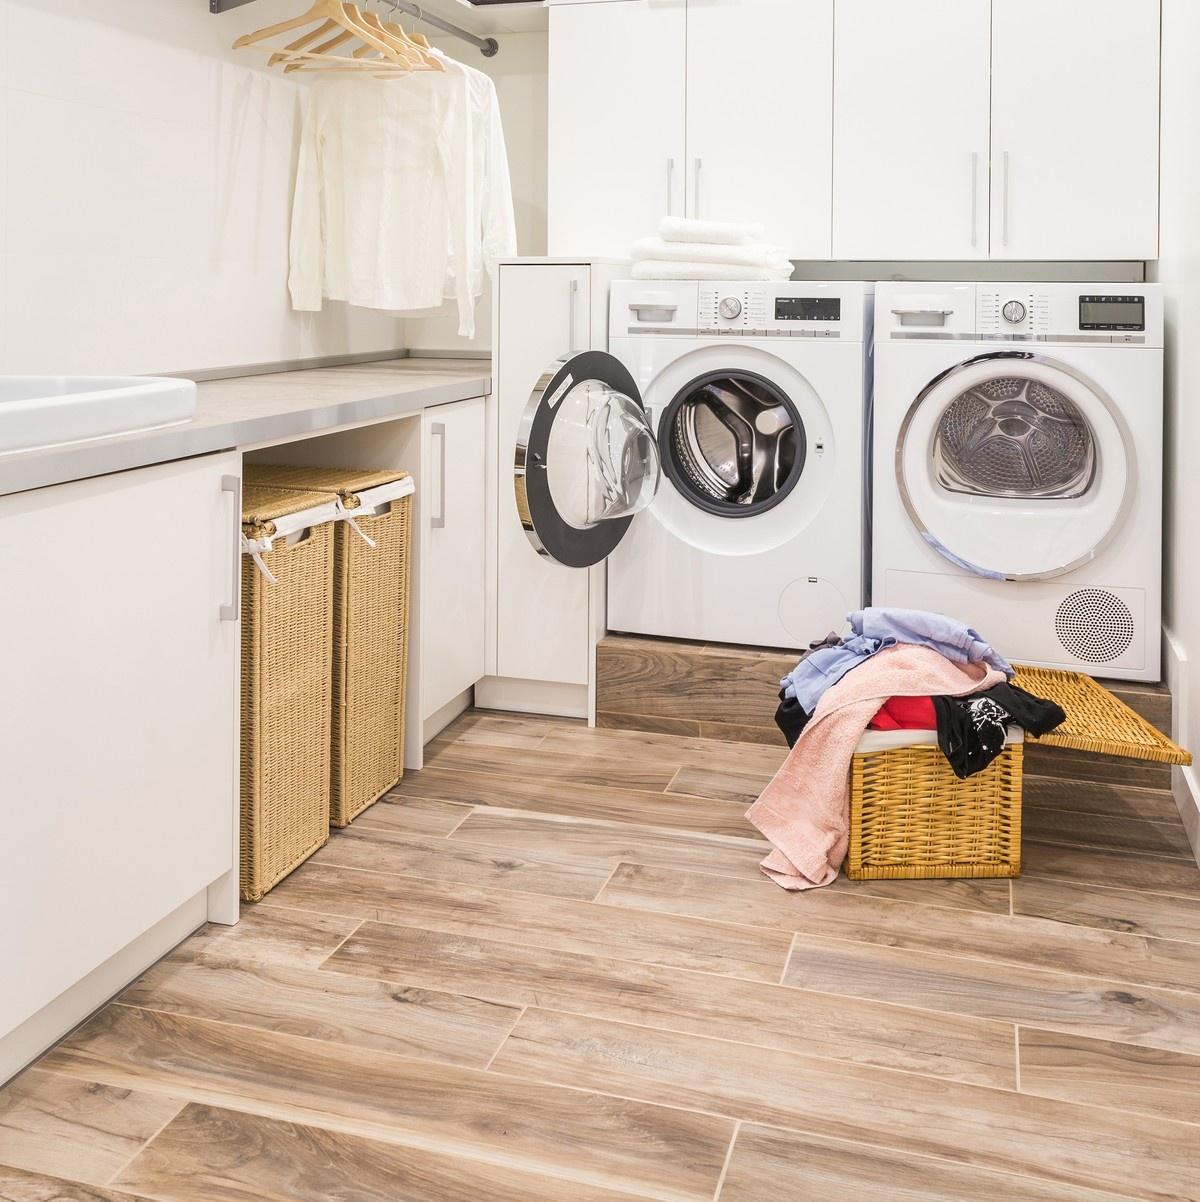 Laundry Room Decorating Ideas - Tidy Up